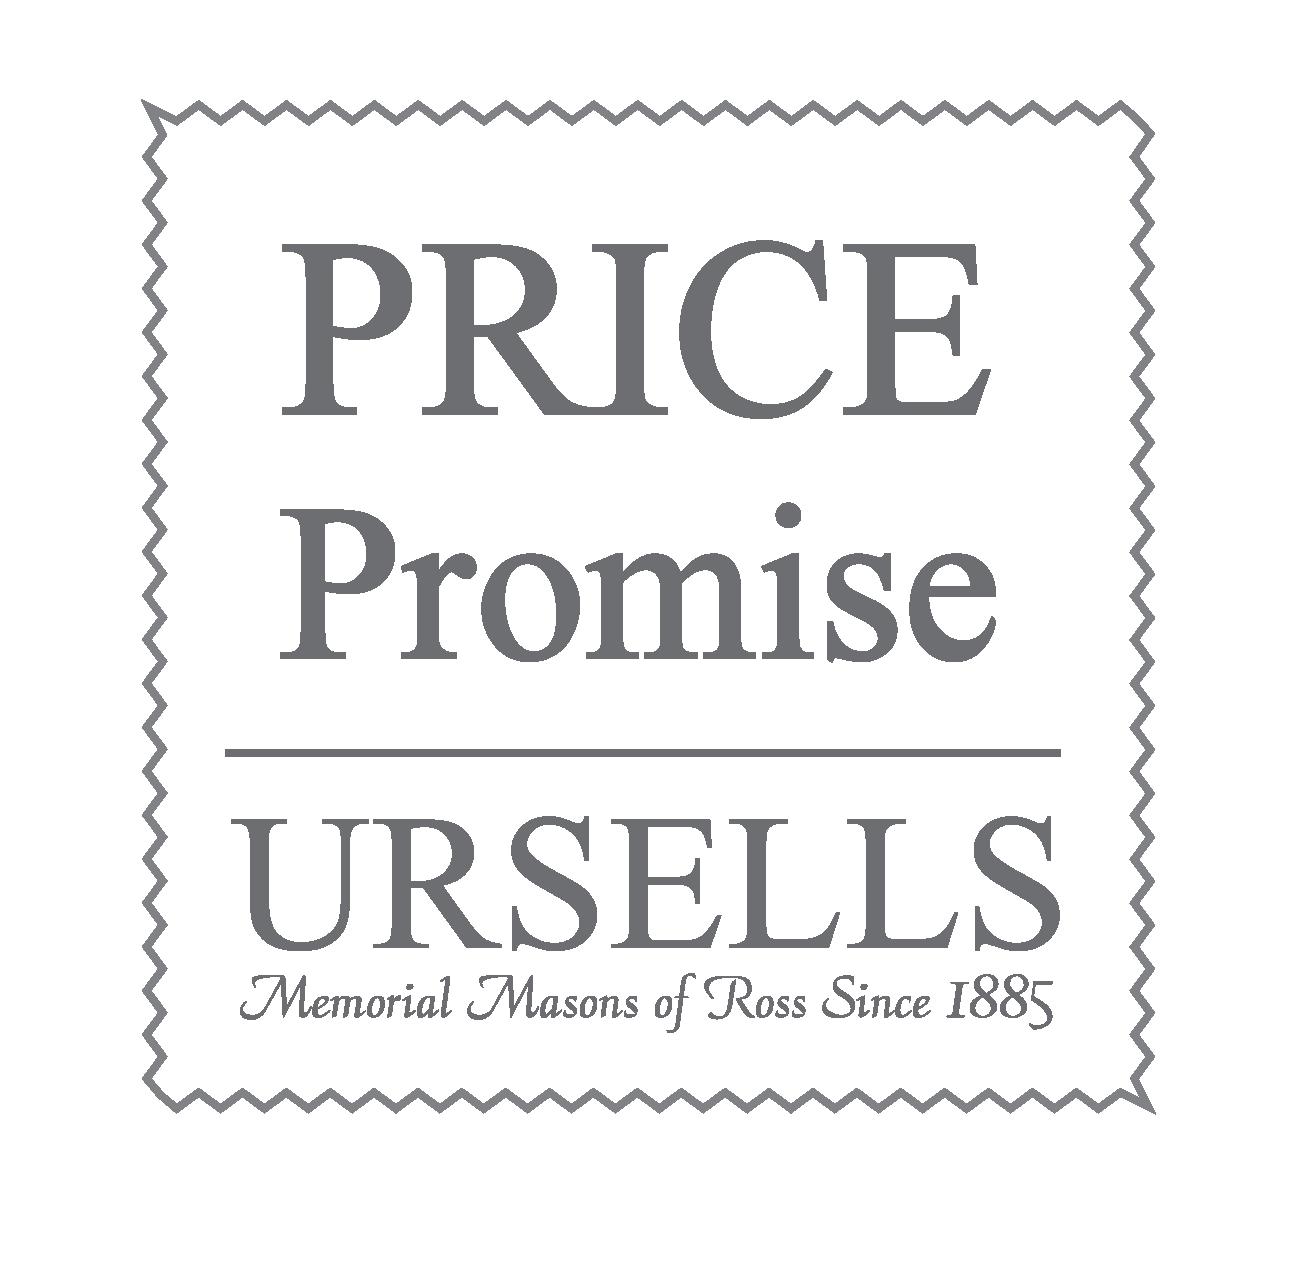 Ursells Price Promise Logo